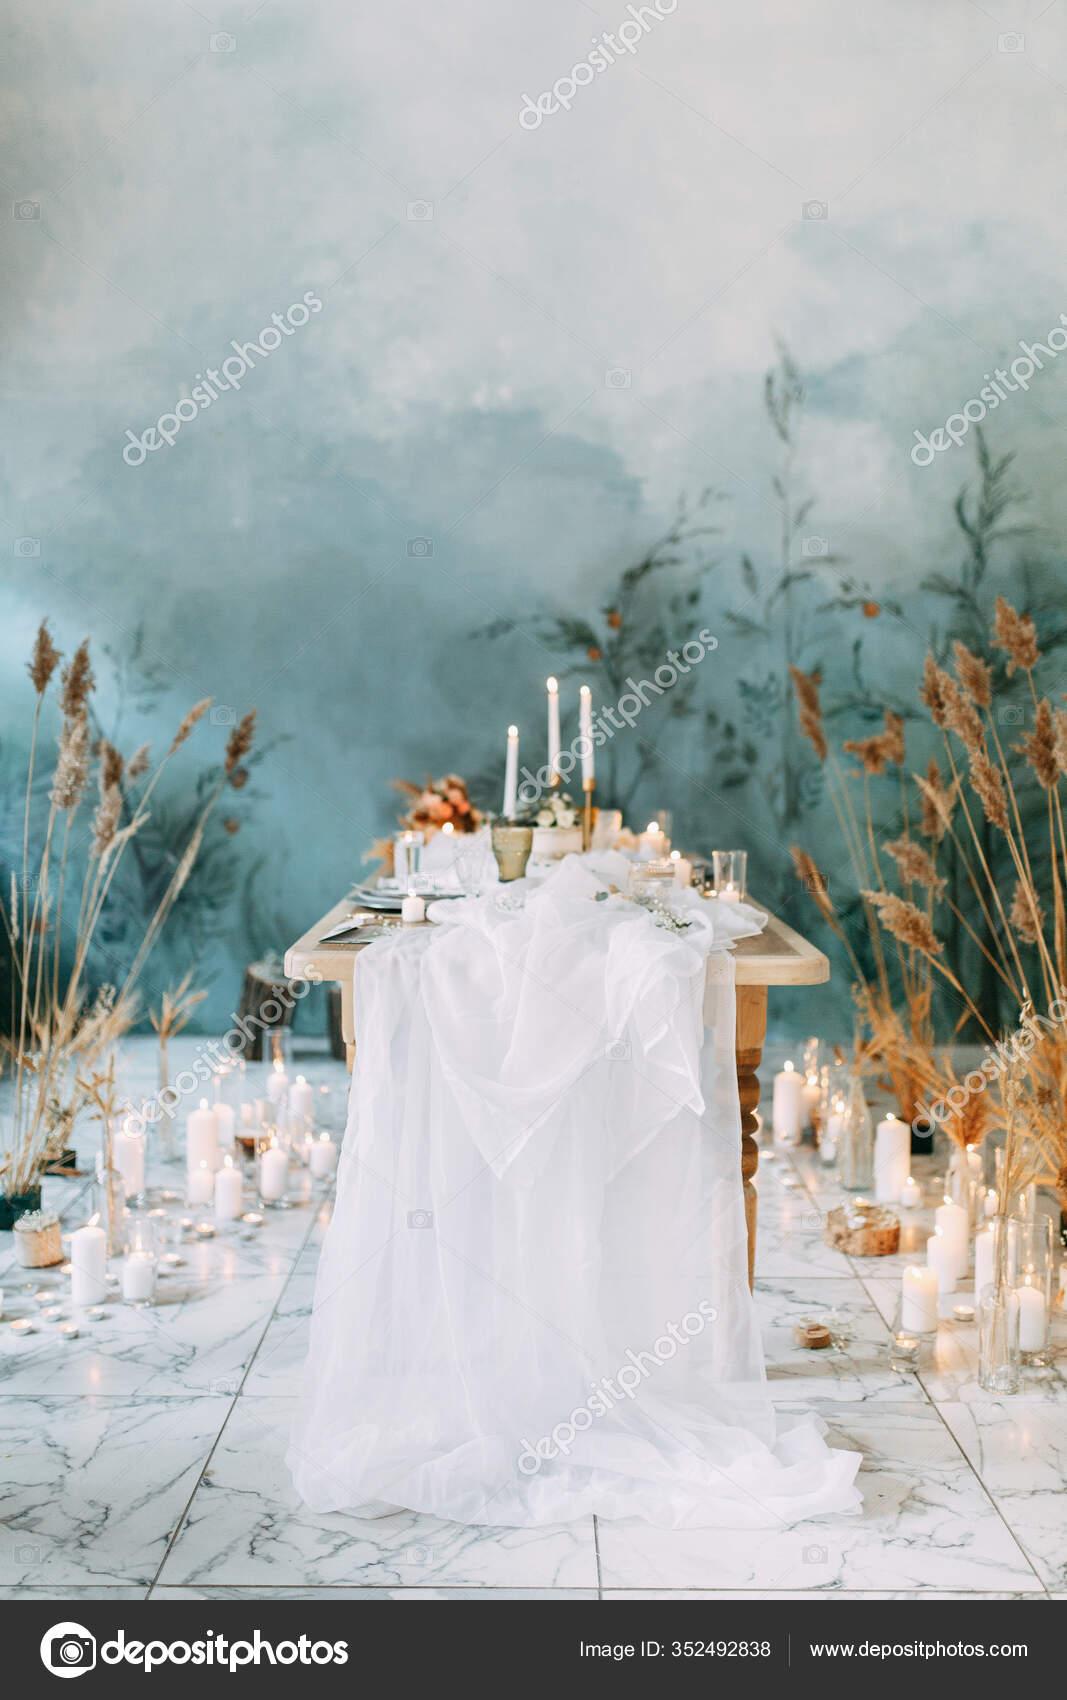 Autumn Decor Fabric Dried Flowers Wedding Style Fine Art Wedding Stock Photo C Pavelvozmischev 352492838